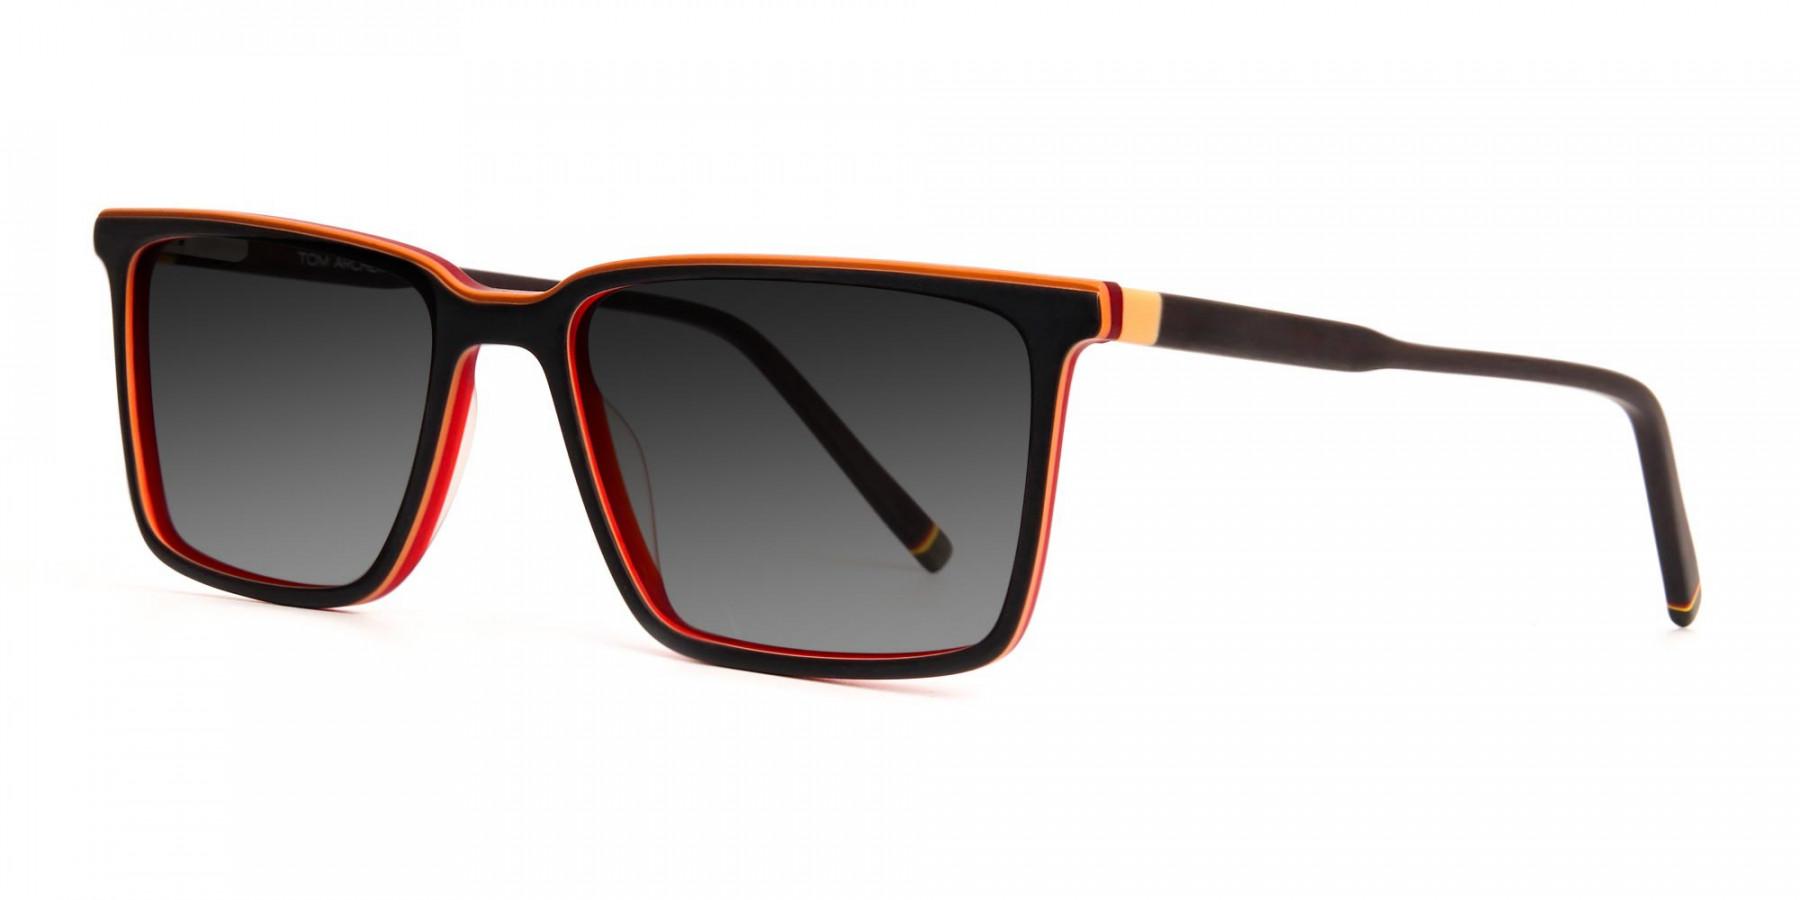 black-and-orange-rectangular-full-rim-grey-tinted-sunglasses-frames-3